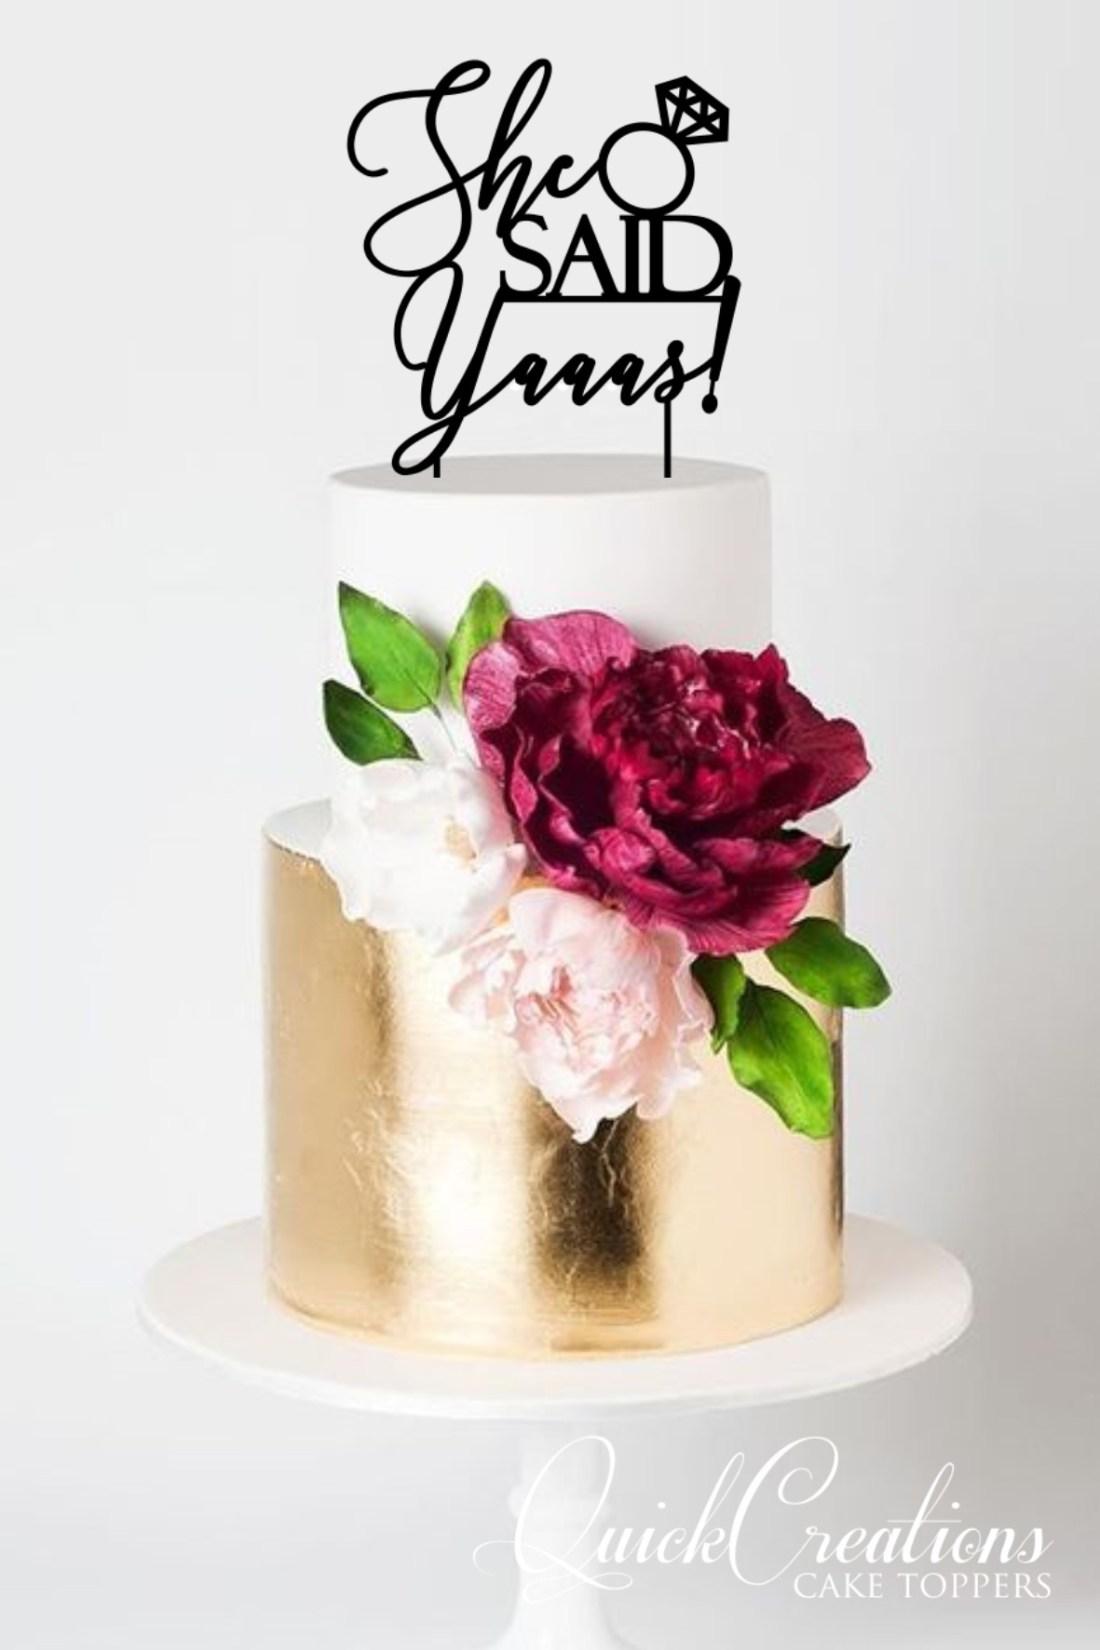 Quick Creations Cake Topper - She Said Yaaas